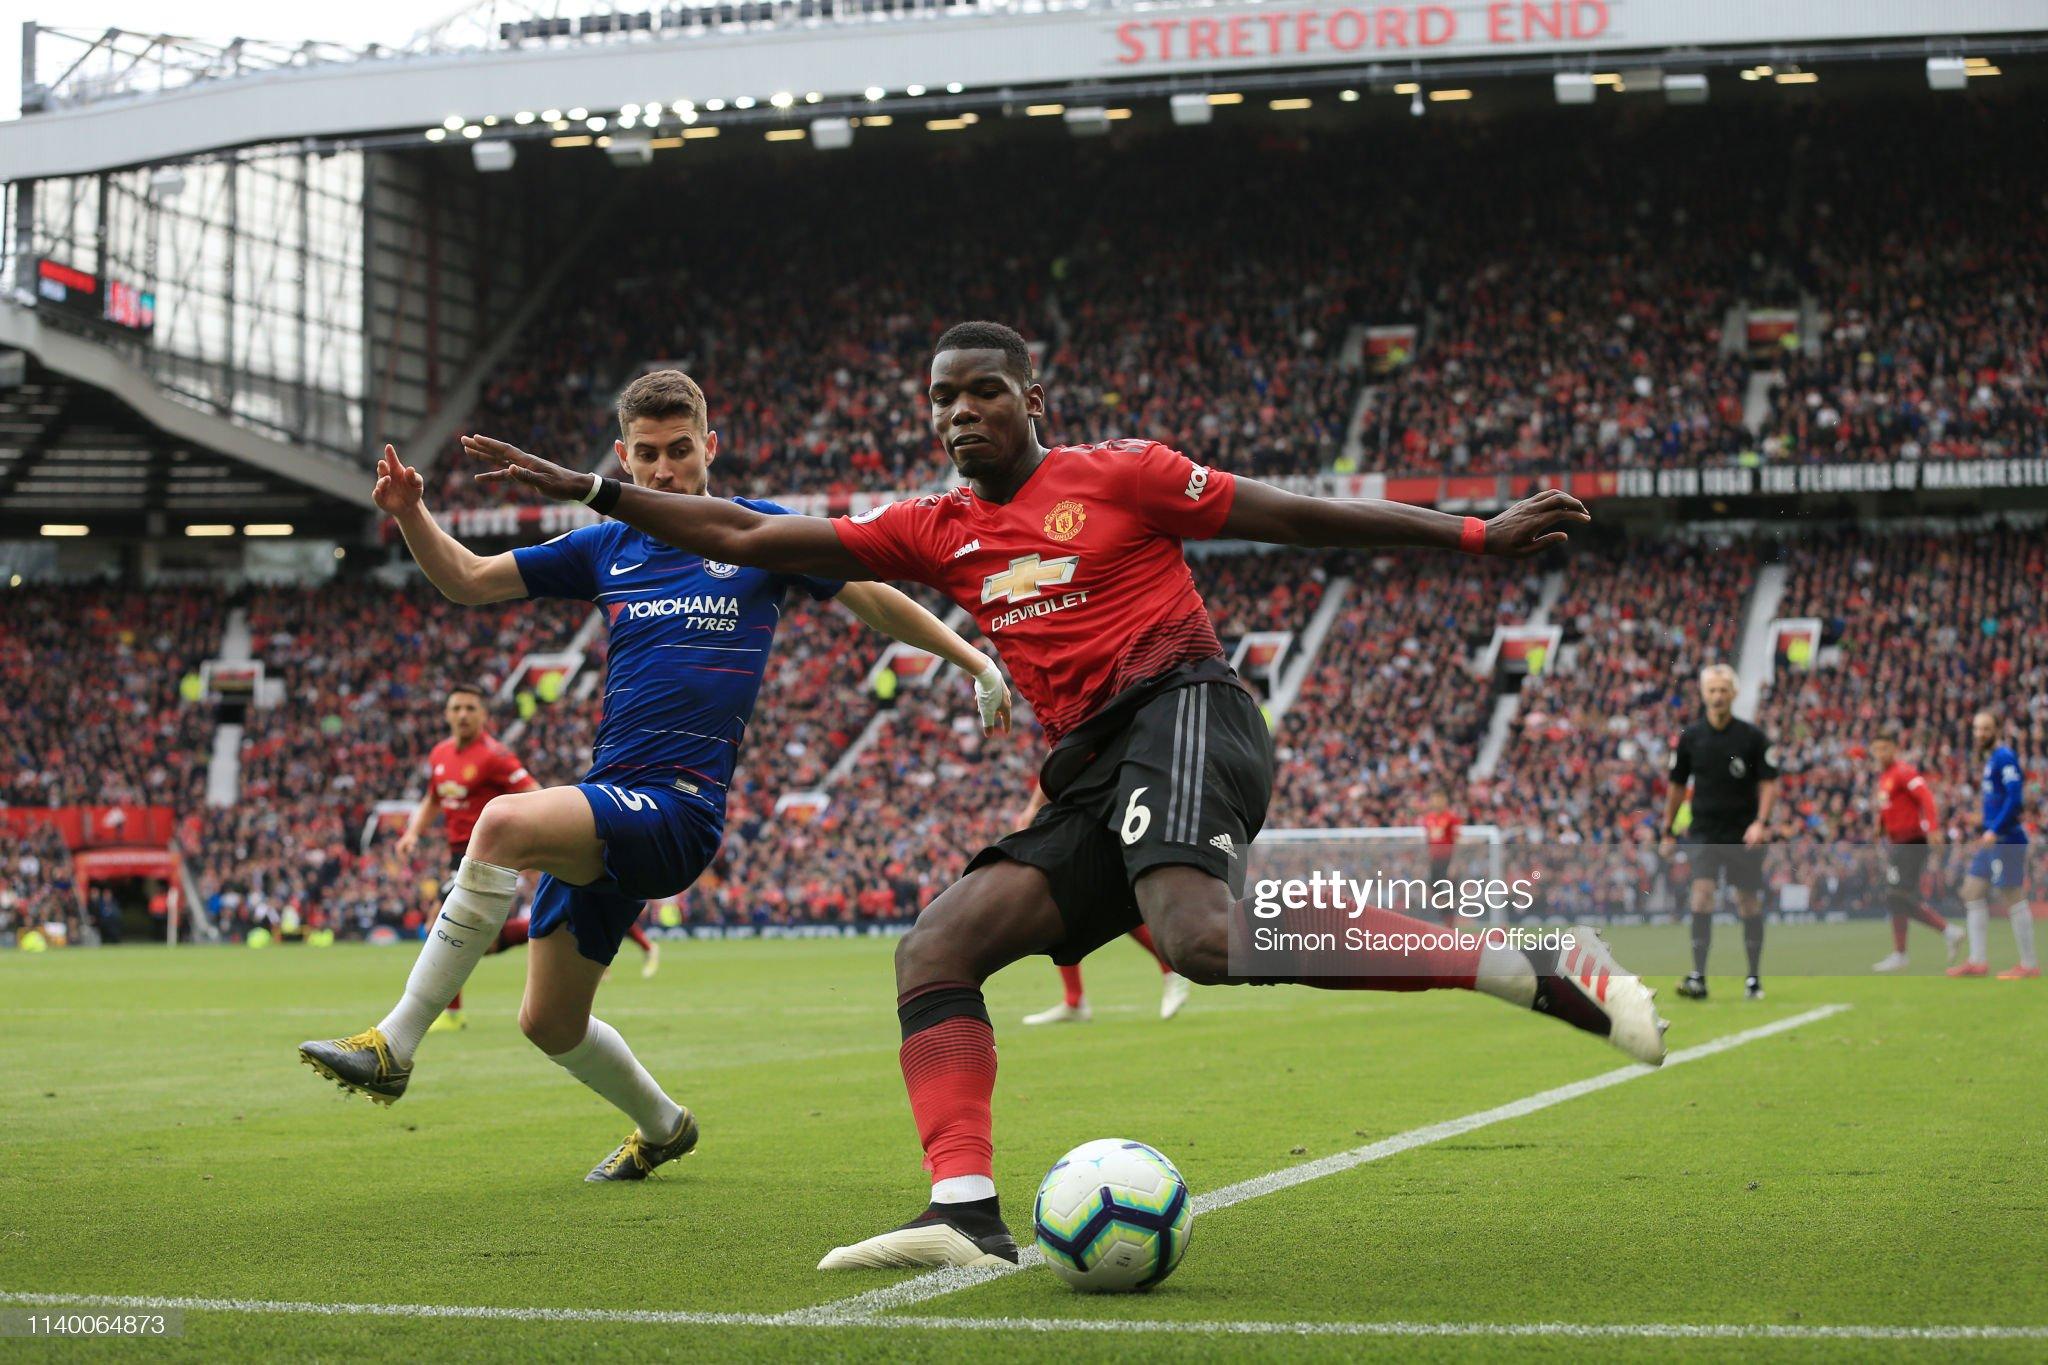 Manchester United v Chelsea - Premier League : Fotografia de notícias